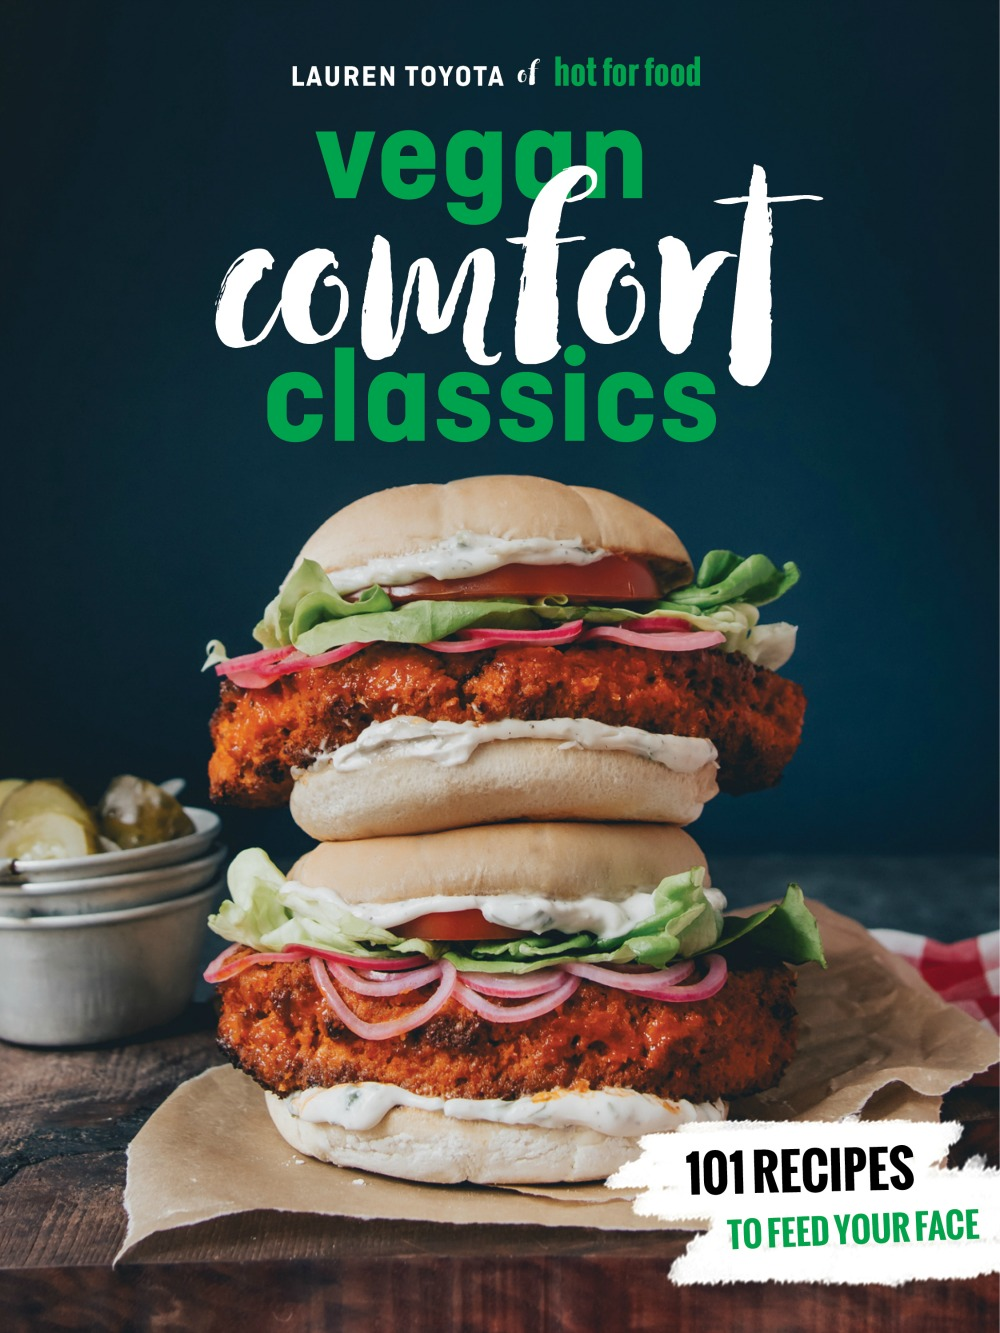 hotforfood_vegan comfort classics cookbook cover